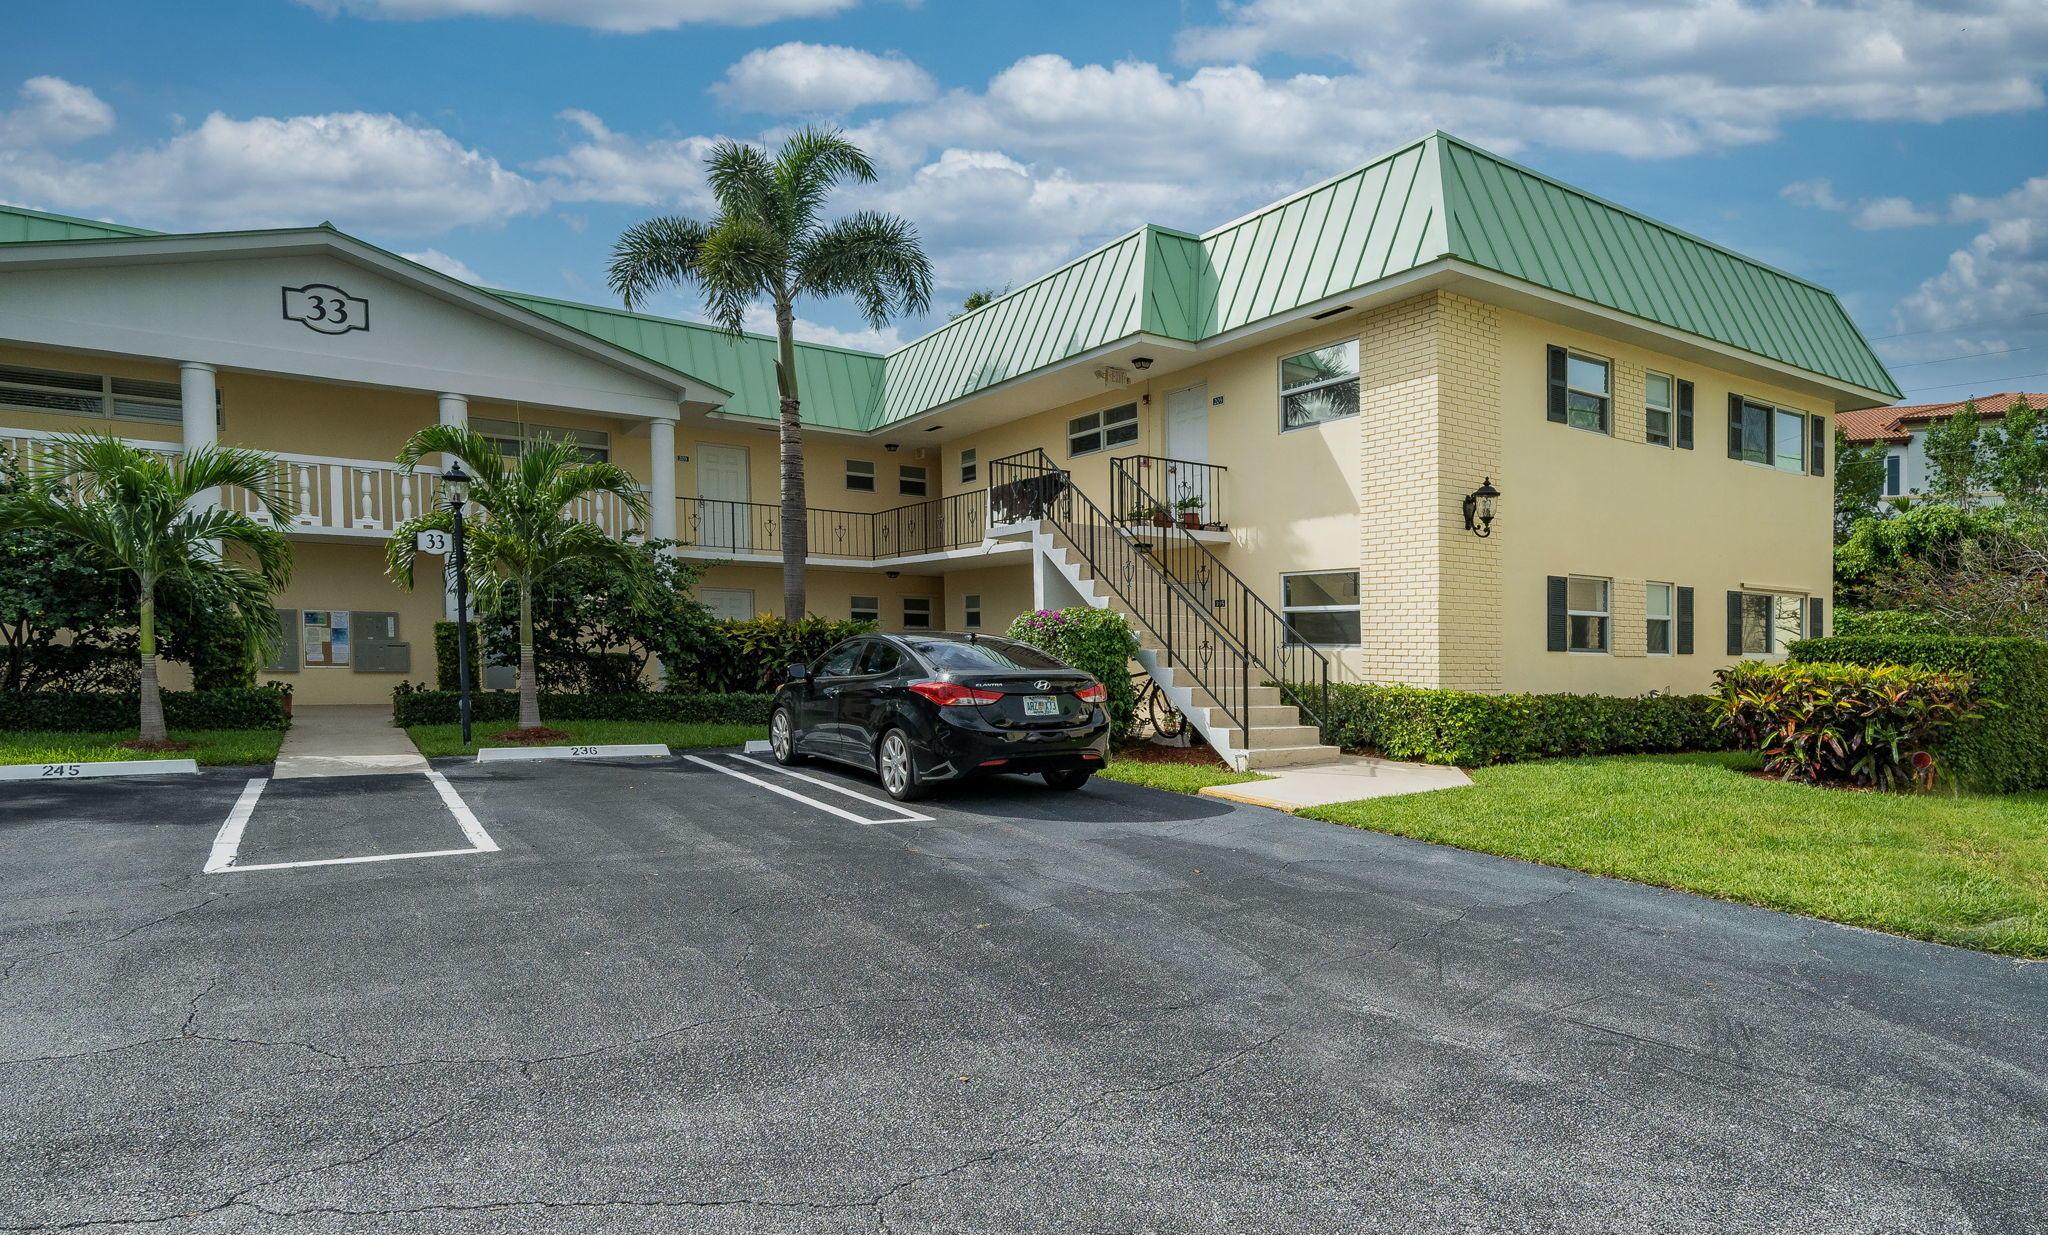 33 Colonial Club Drive 104 Boynton Beach, FL 33435